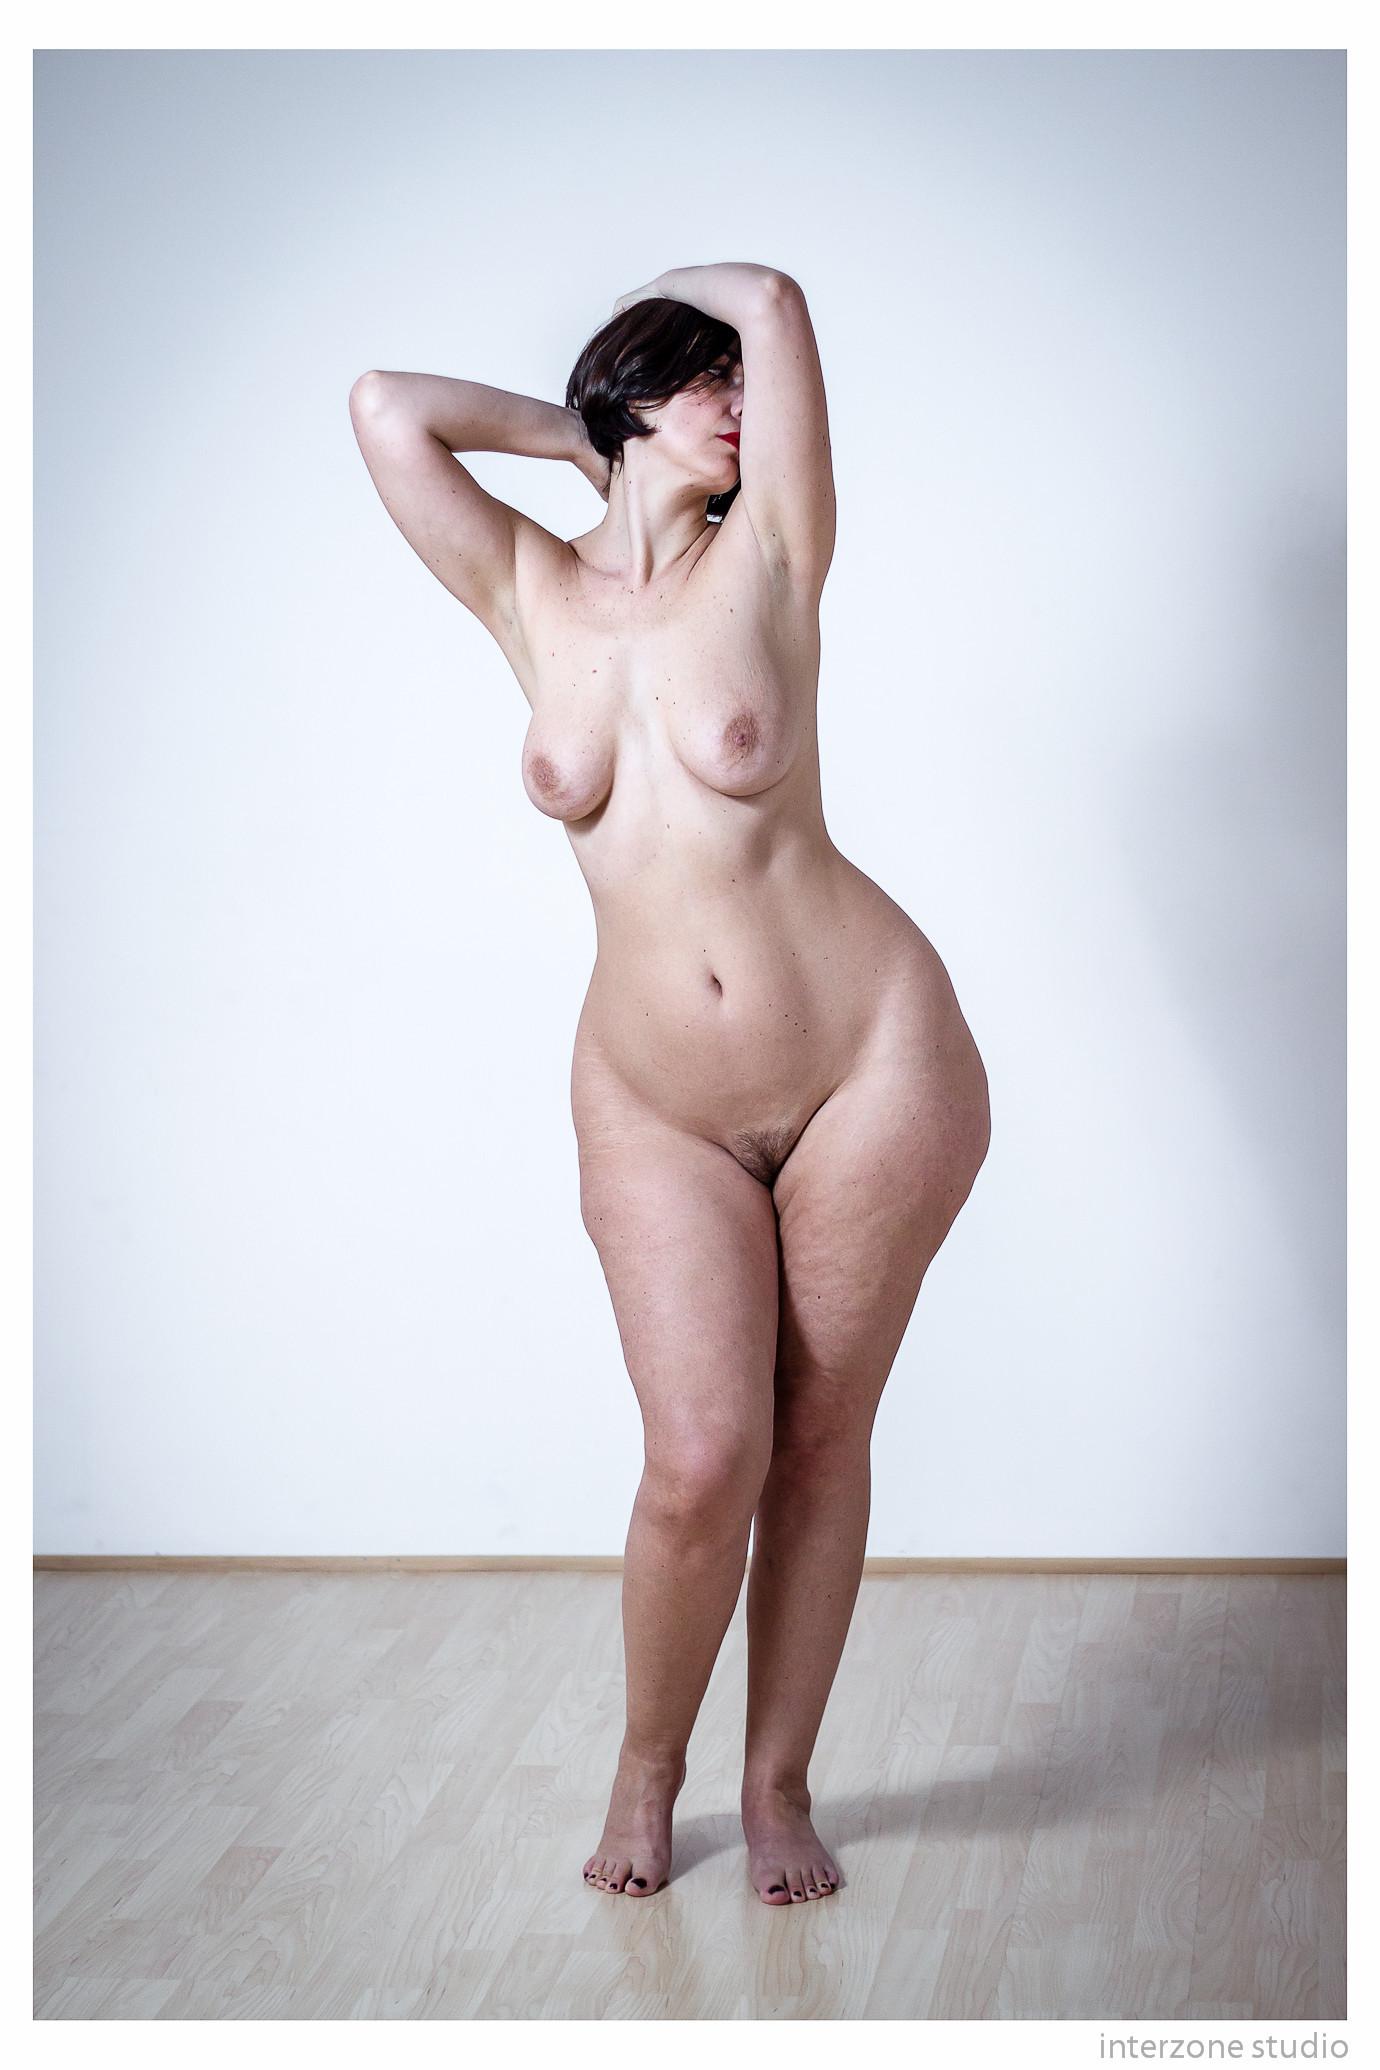 Big hip nude images — img 12